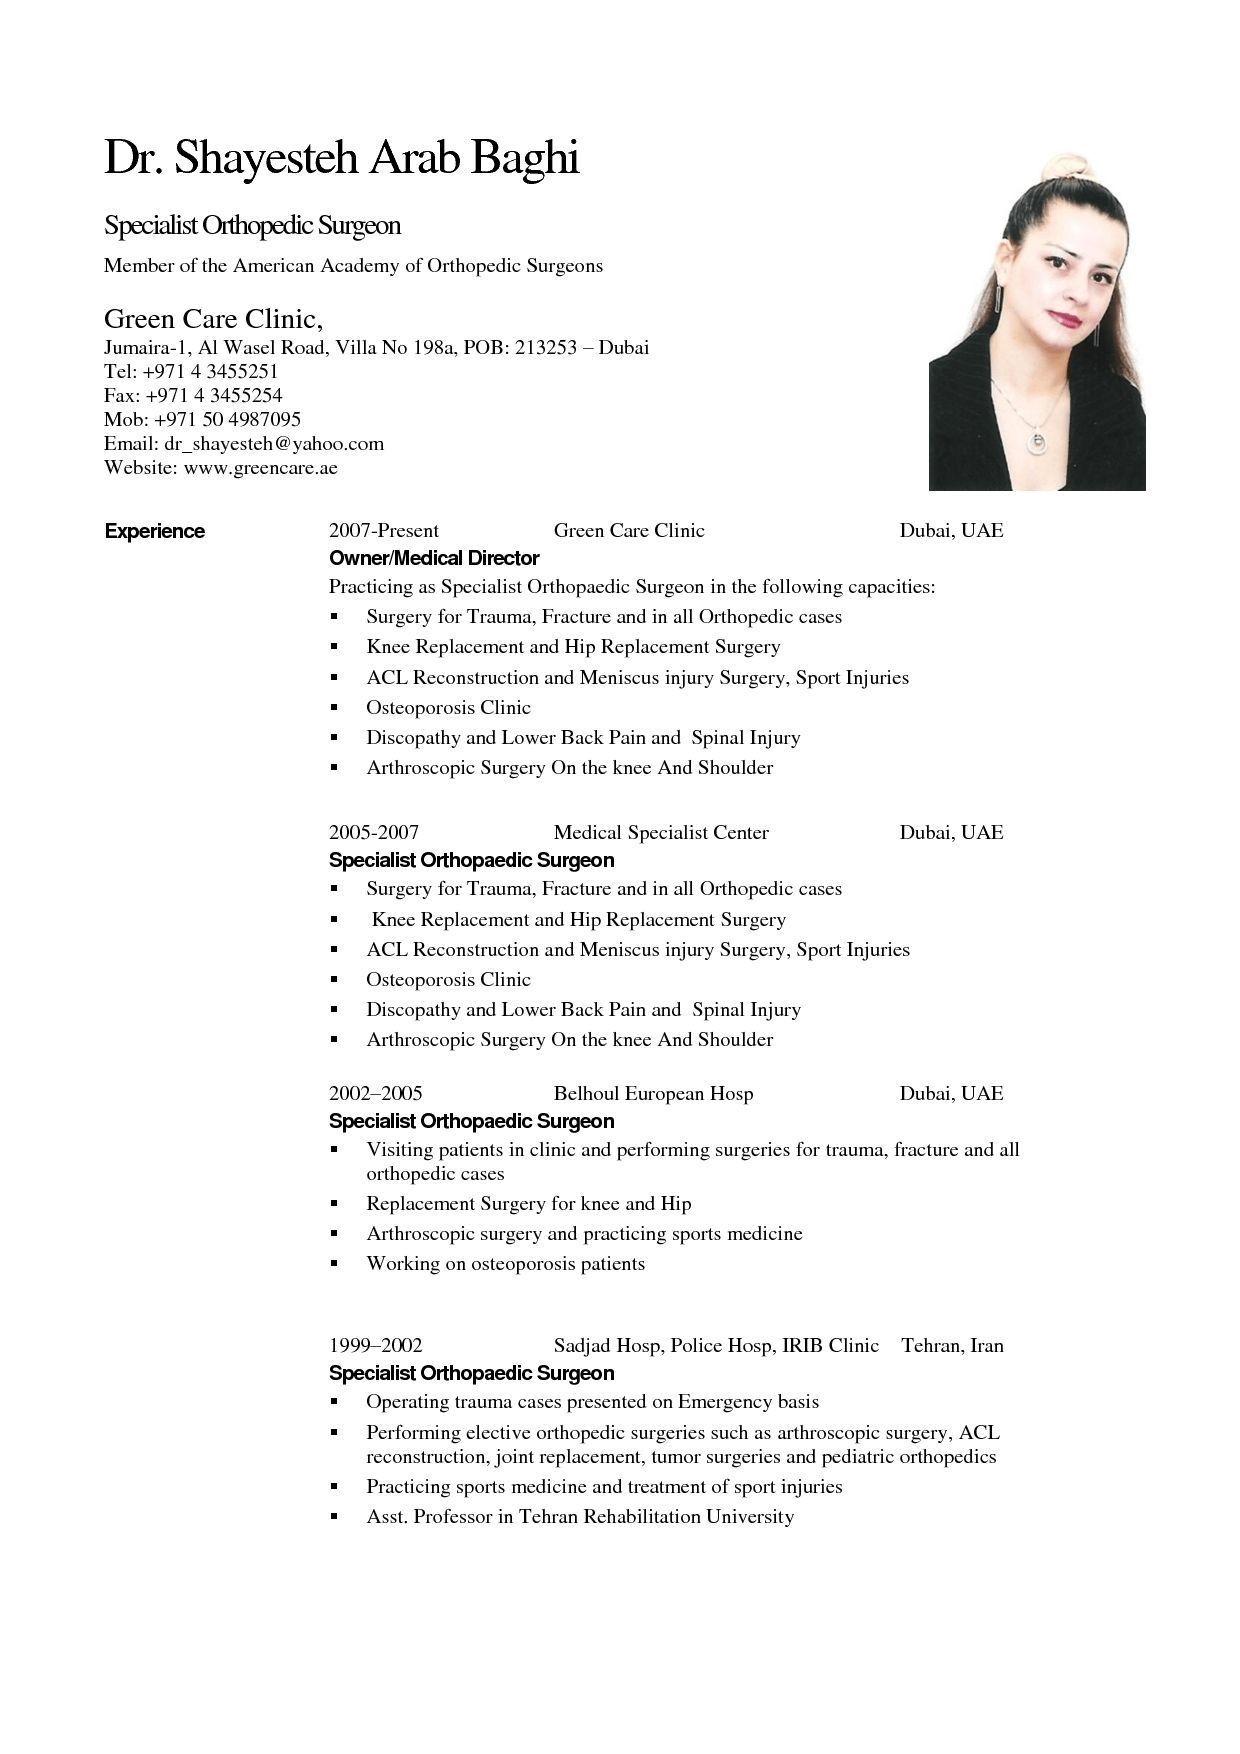 Resume examples Resume Format Uae Resume examples in